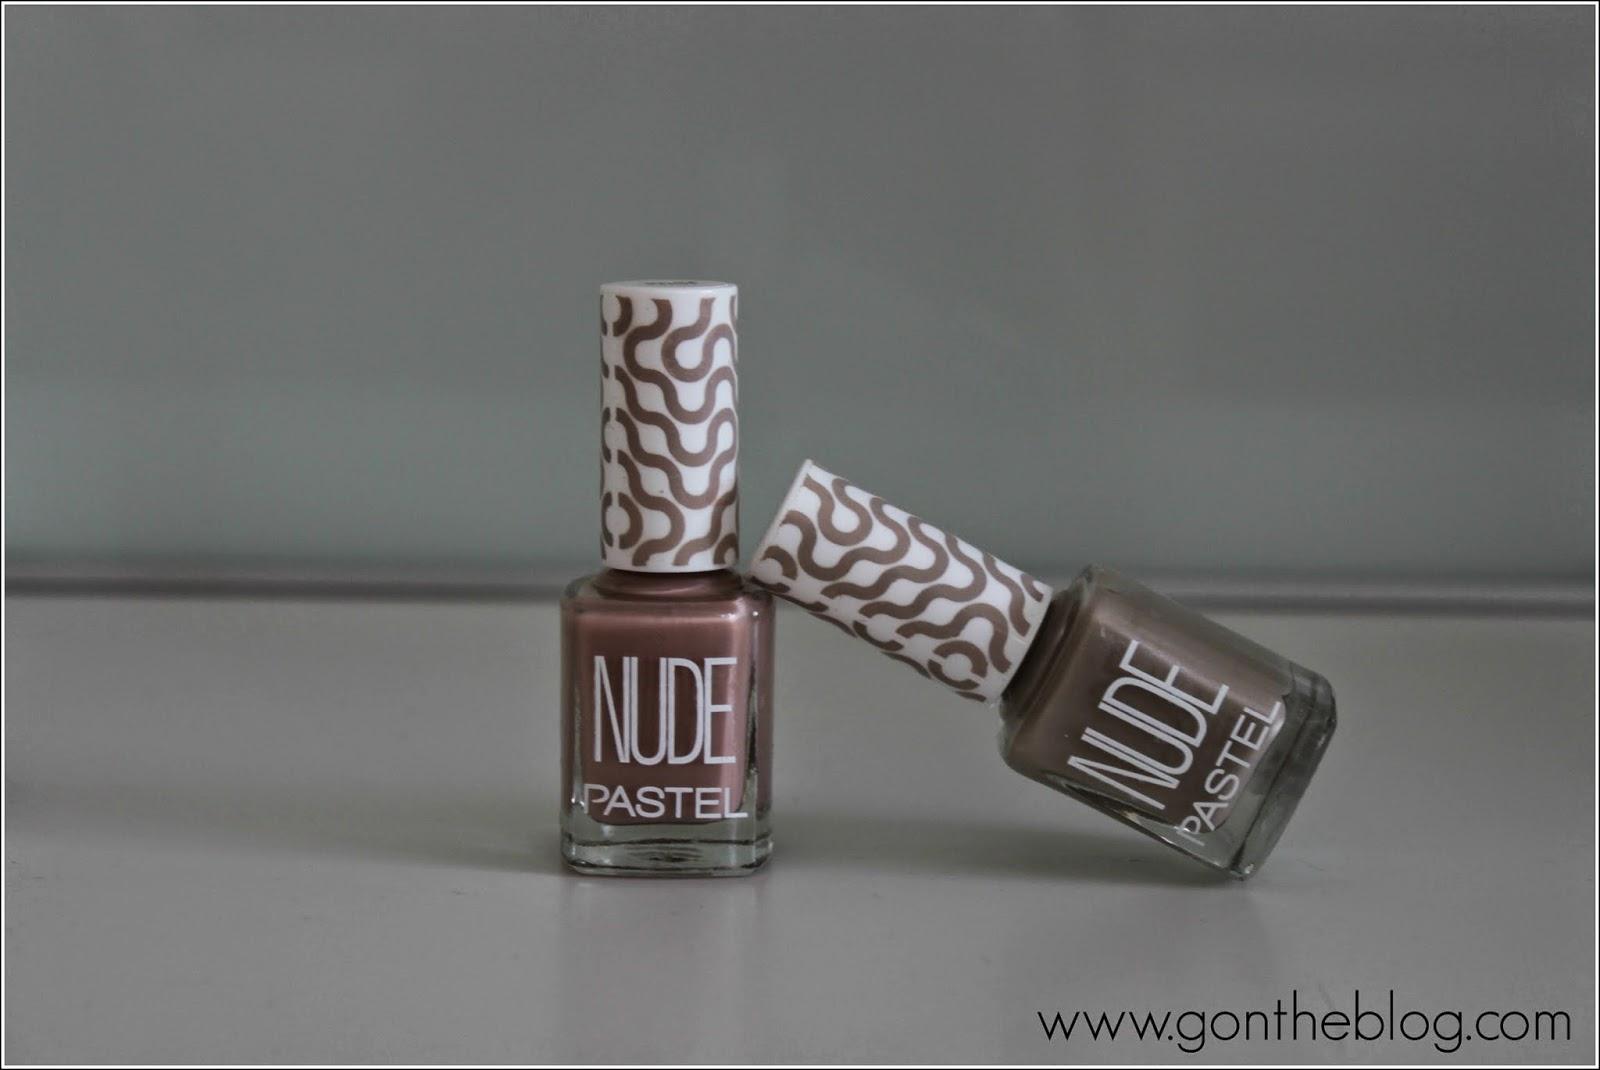 Pastel Nude Oje Serisi Rose & Mocha